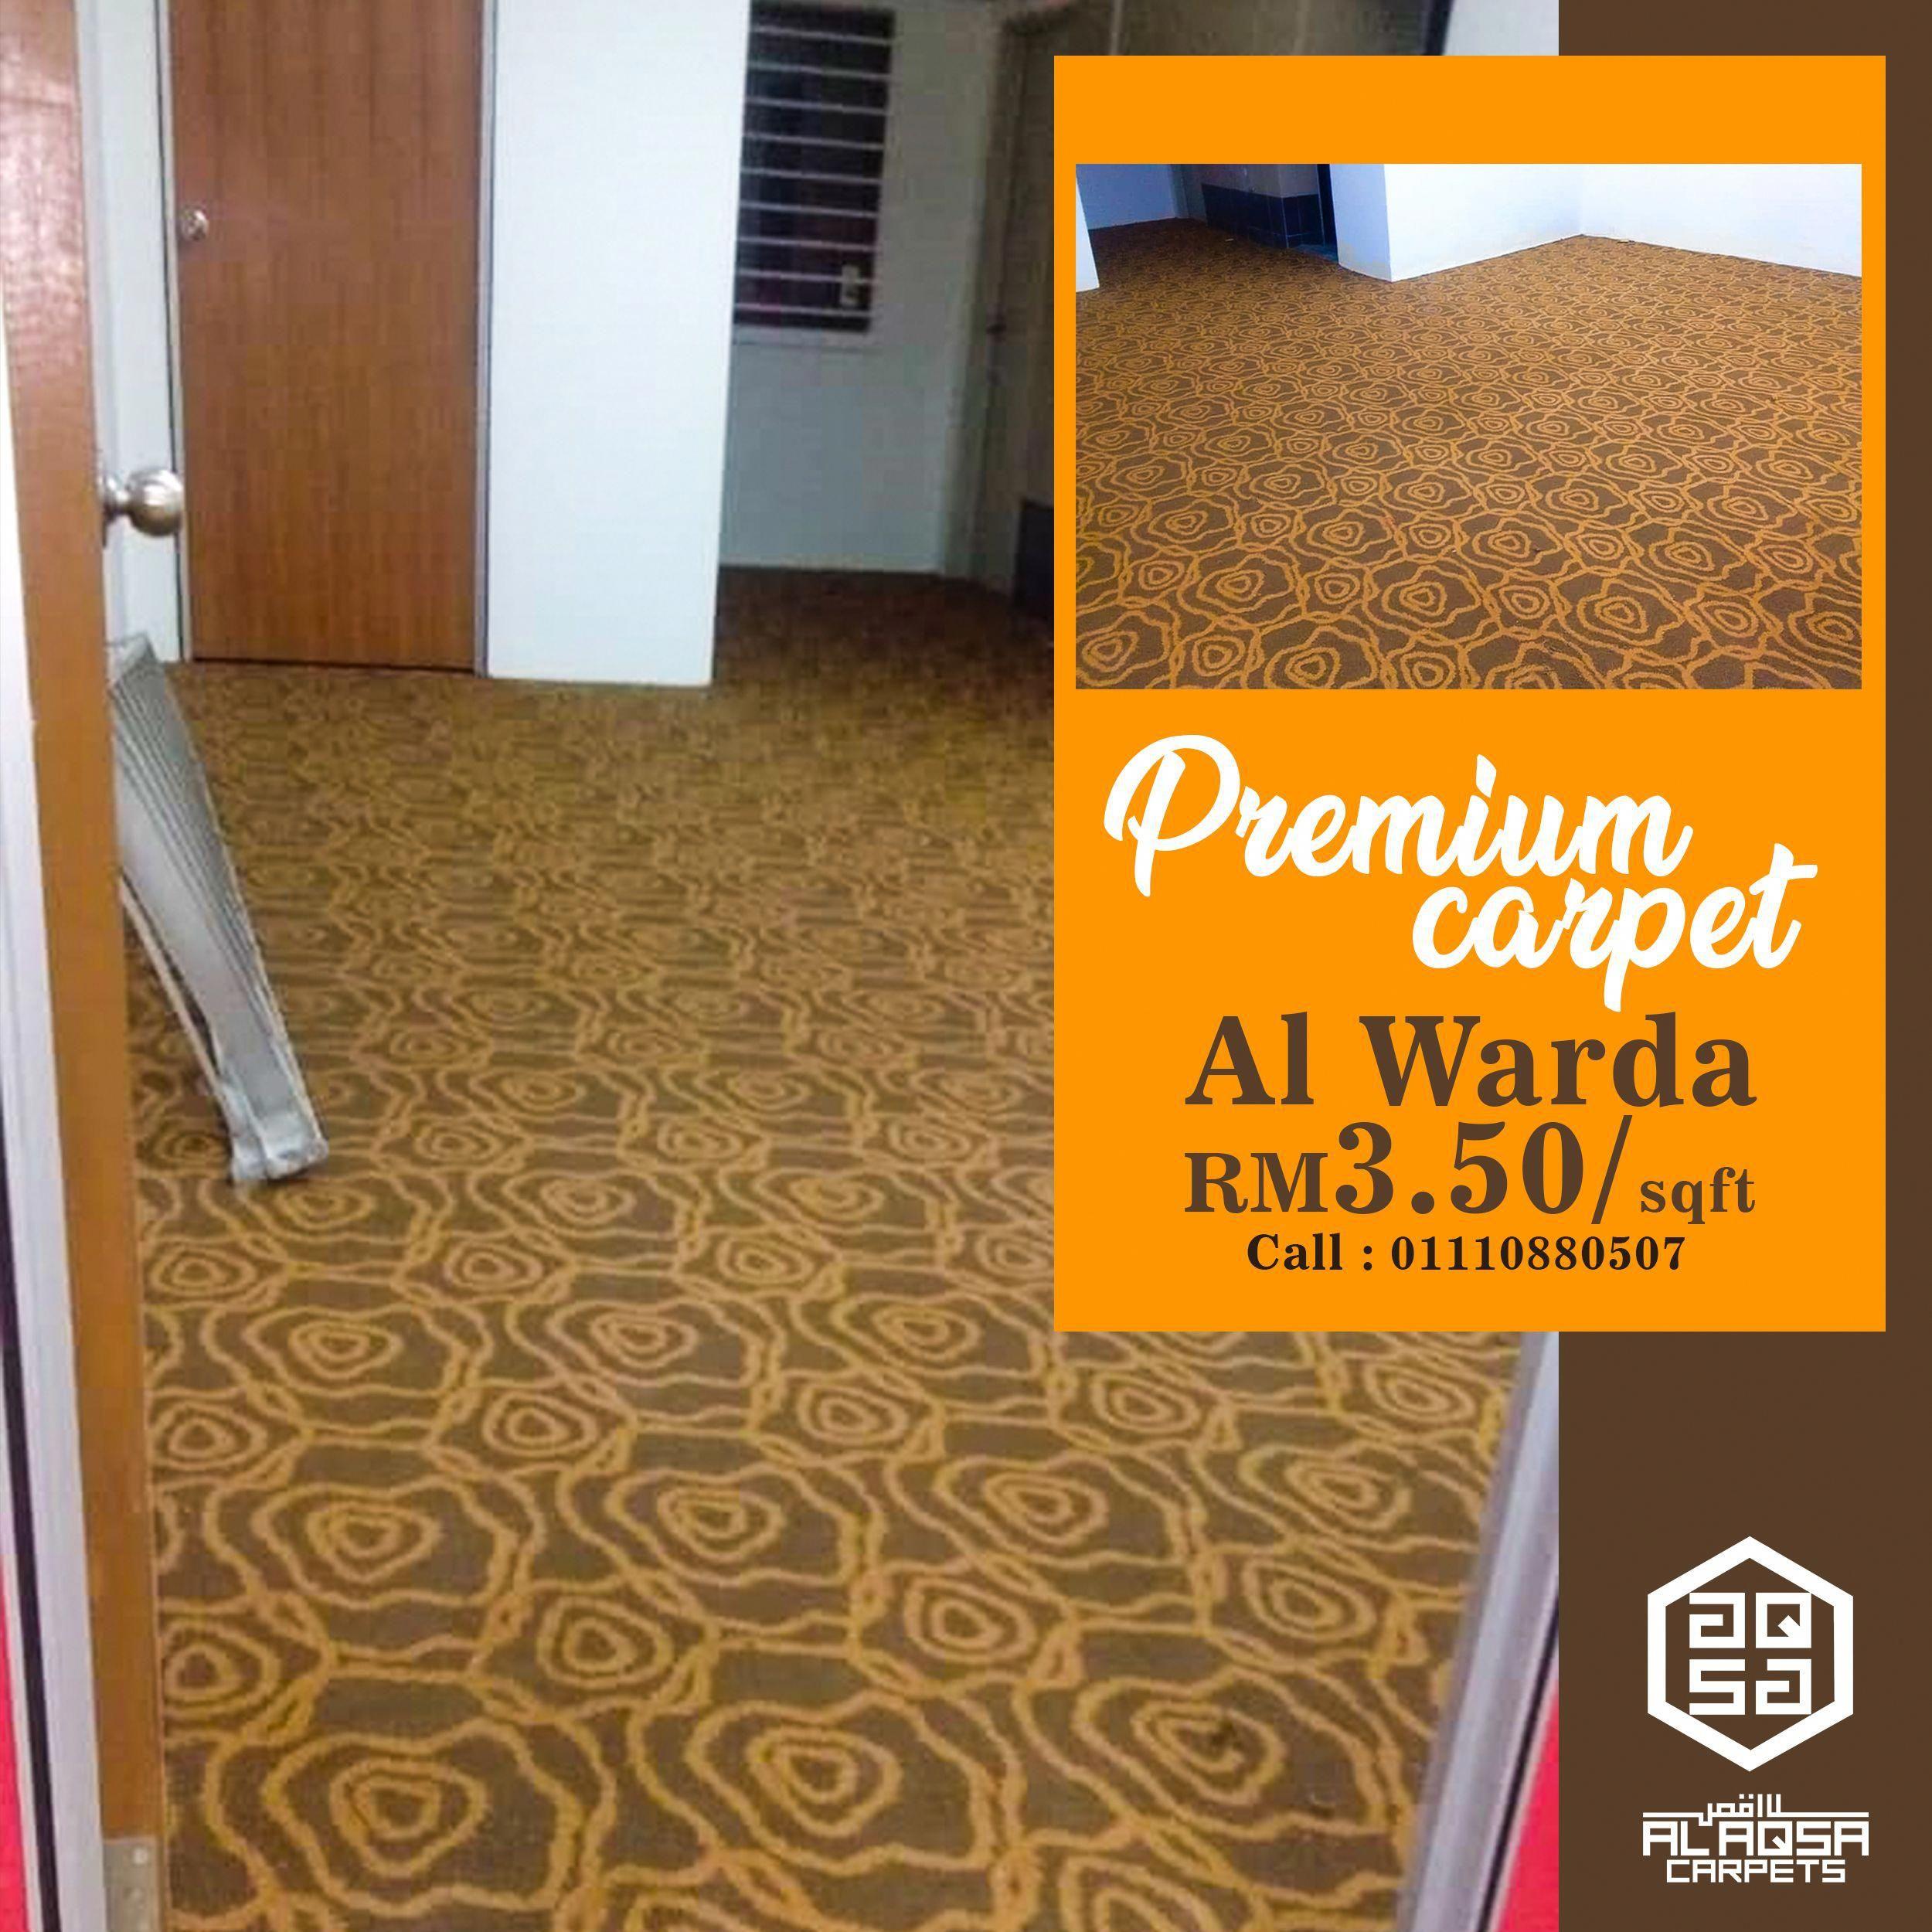 Ebaycheapcarpetrunners Post 7777255975 Carpetslivingroom Carpet Carpets For Less Carpets For Kids